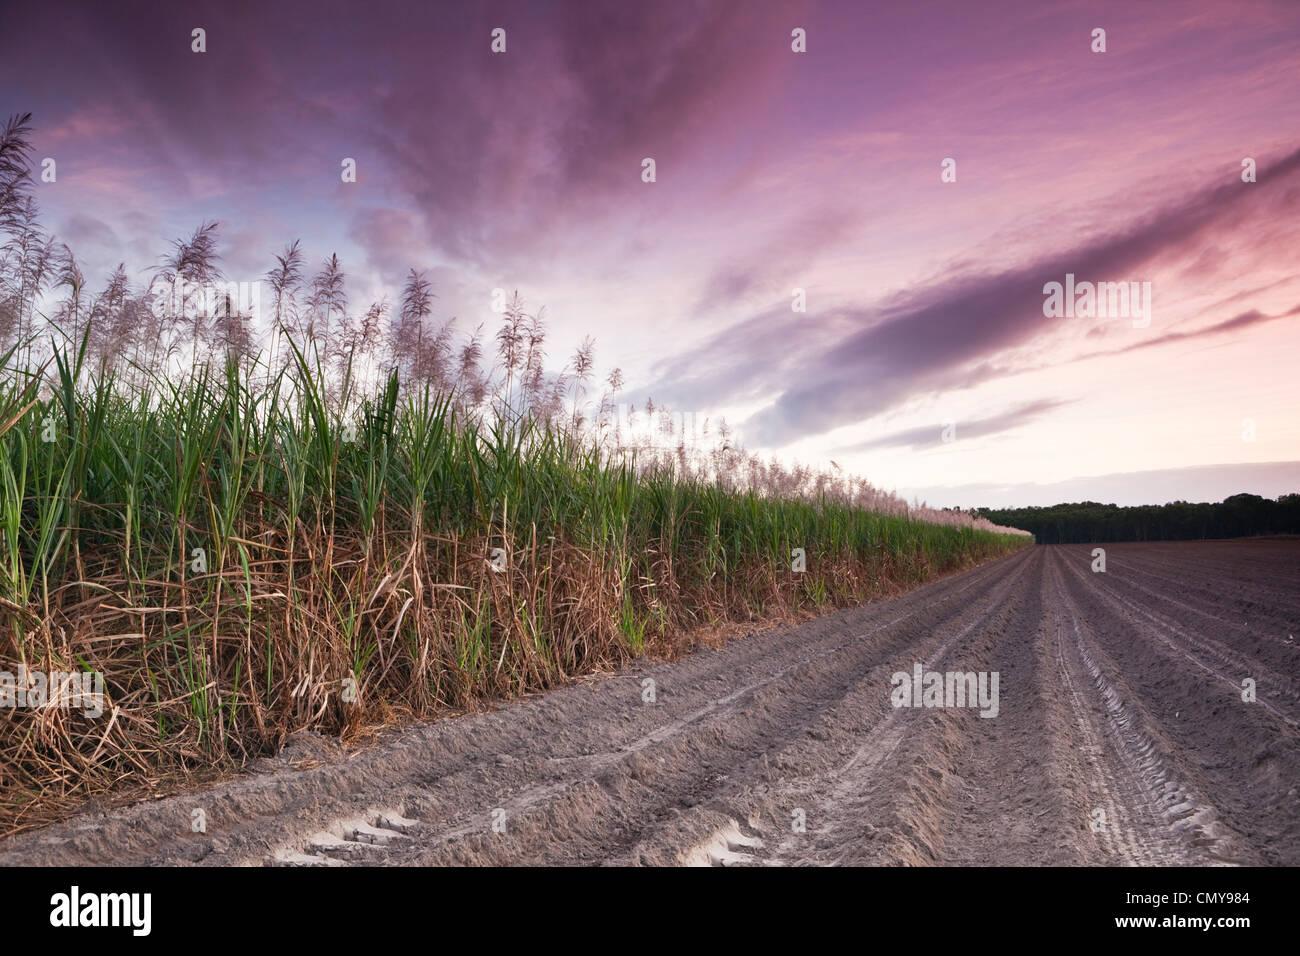 Zuckerrohr-Feld in der Dämmerung.  Mossman, Queensland, Australien Stockbild